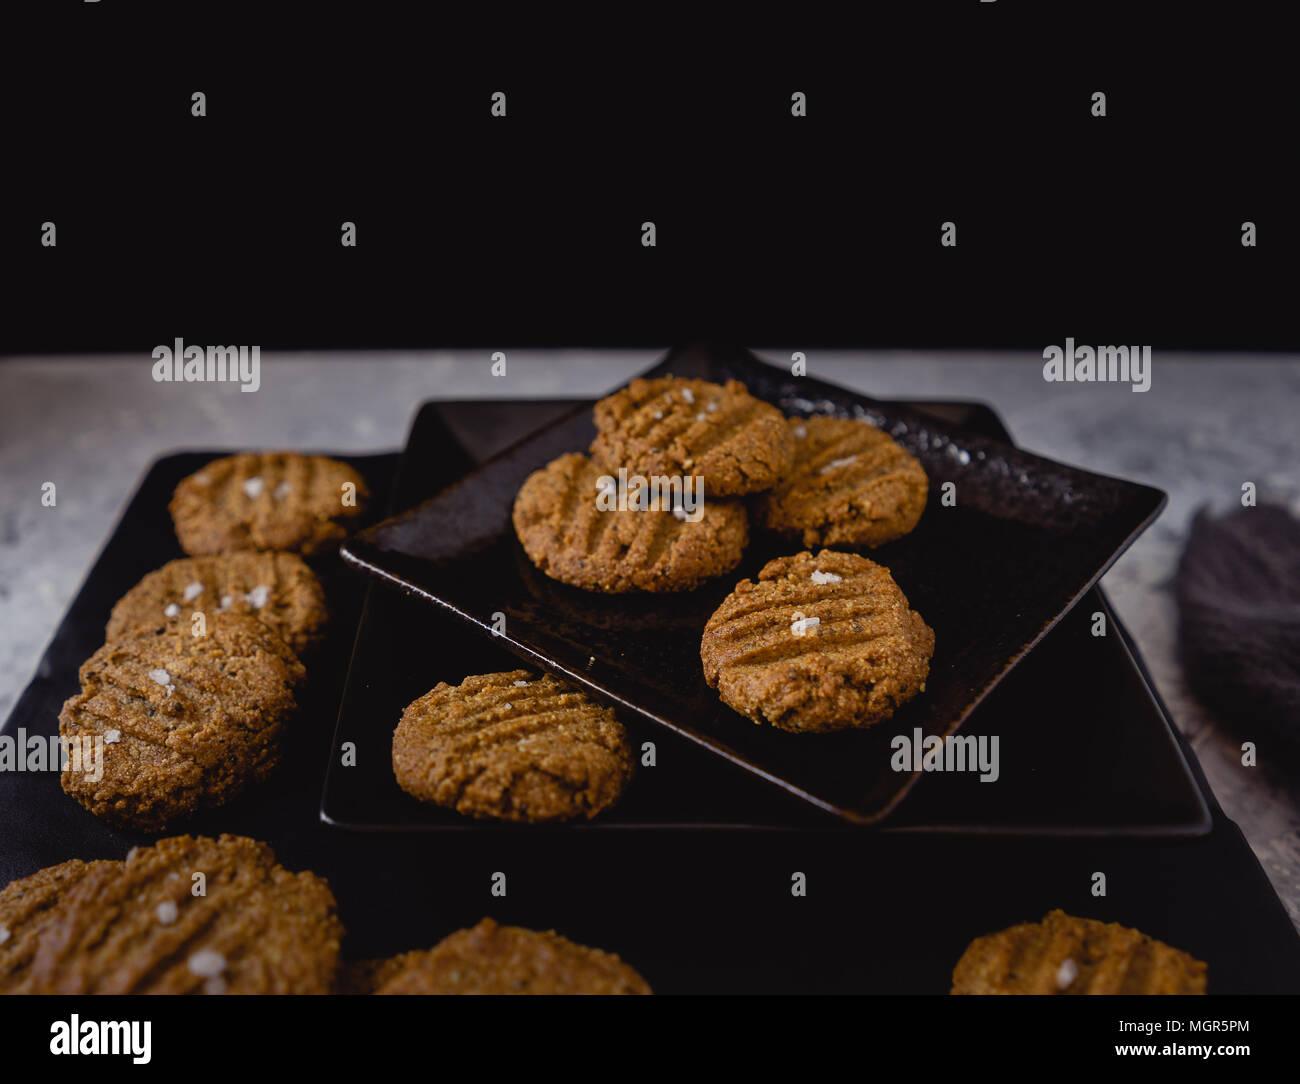 Paleo Vegan Cookies, Dark Background Stock Photo